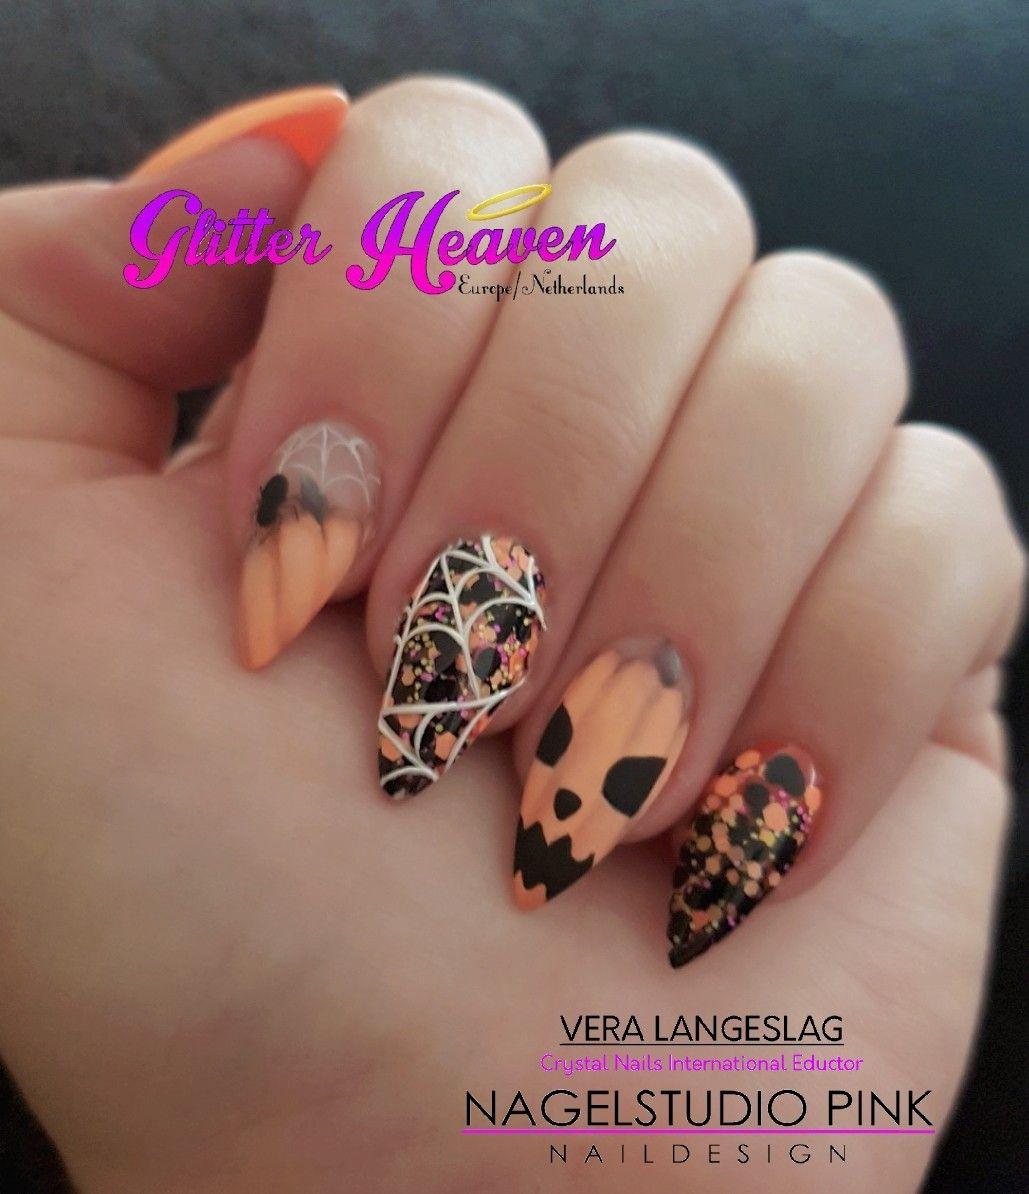 Halloween Arnhem.My Halloween Pumpkin Nails Glitterheaven Veralangeslag Nagelstudiopink Nails Arnhem Sparkle Nailart Glitter Glitterhea Pumpkin Nails Goth Nails Nails